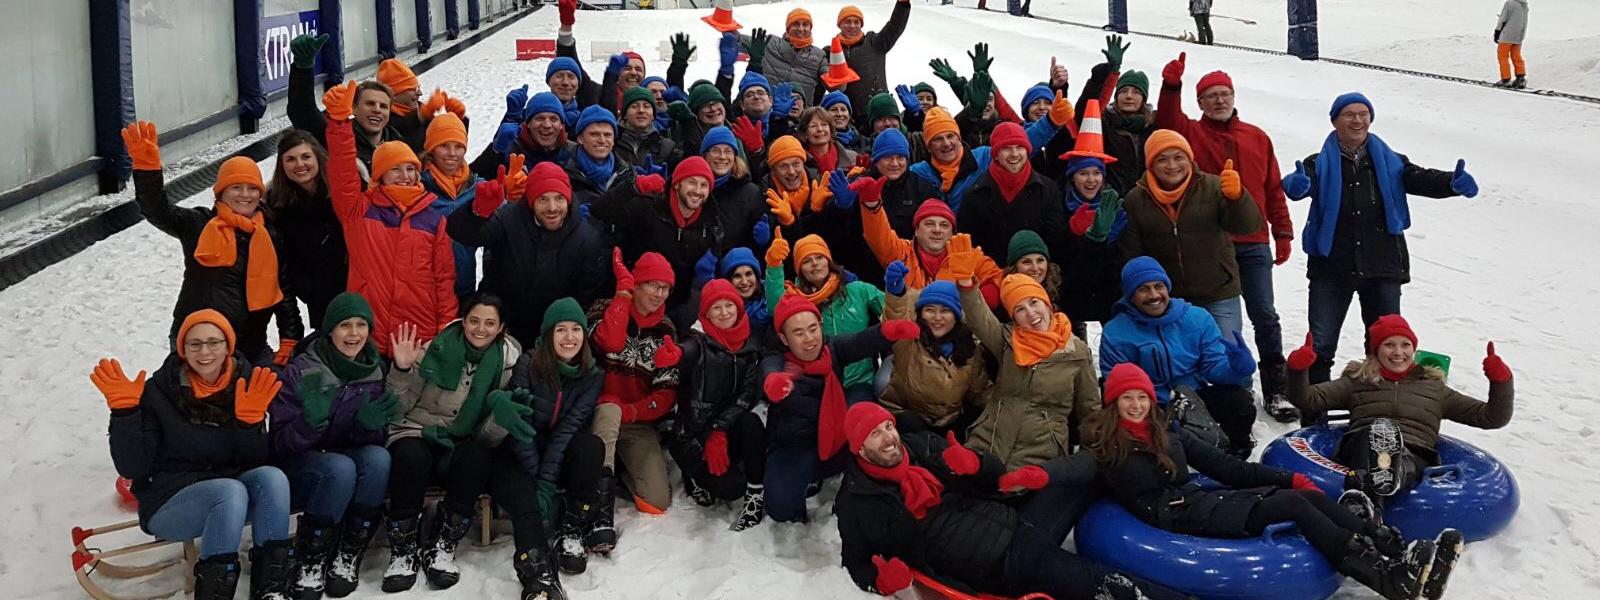 Sneeuwspelen Groep Tilburg